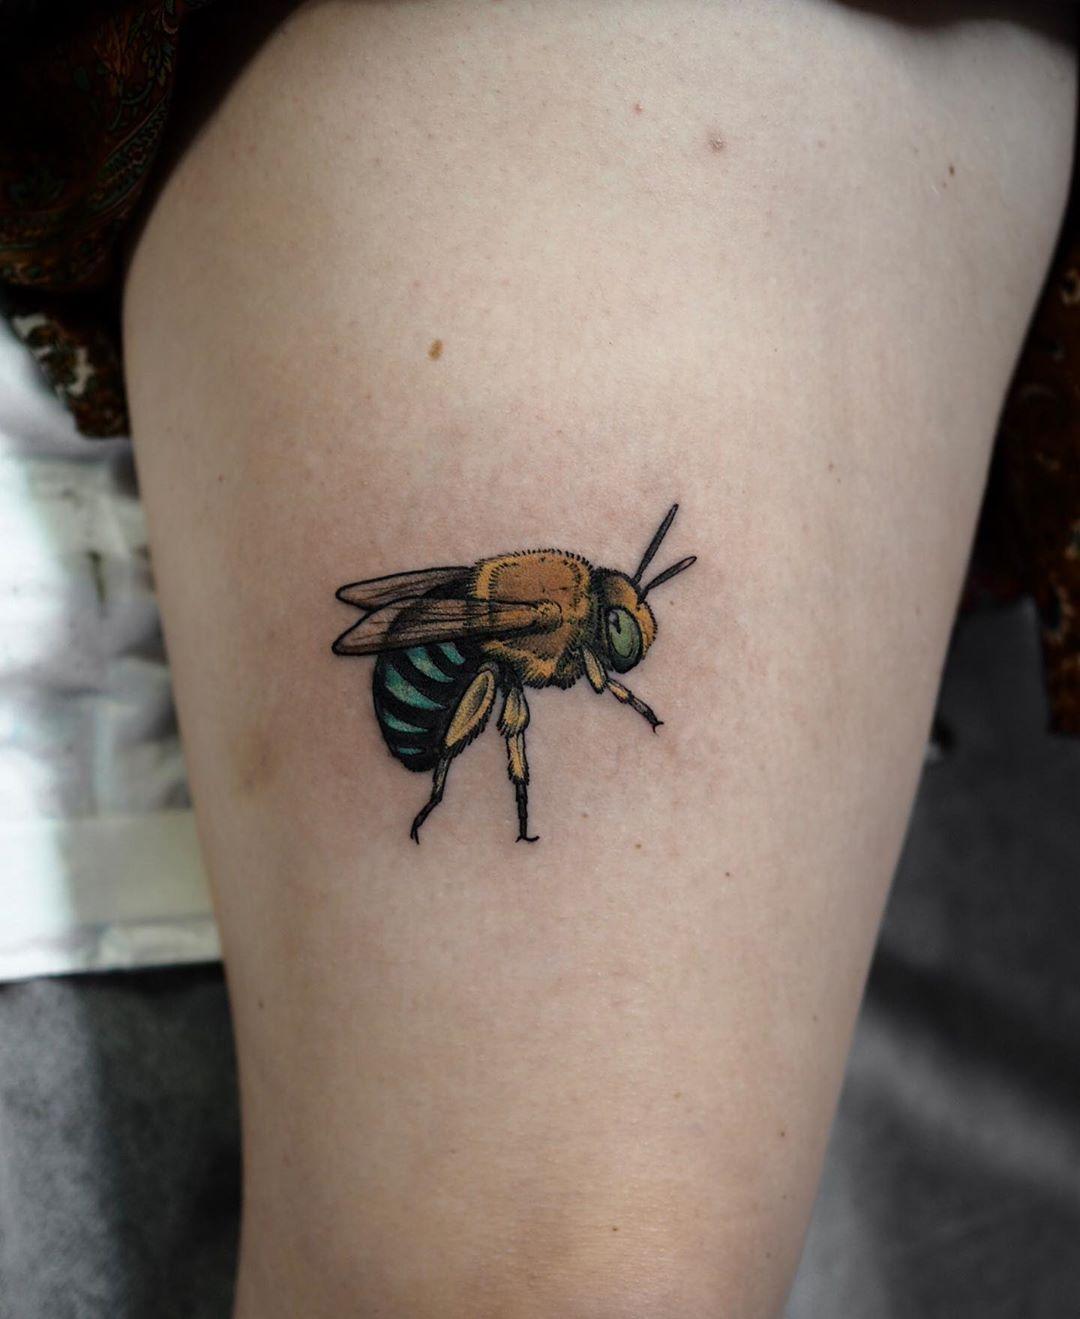 Native Australian Blue banded Bee tattoo by @sophiabaughan